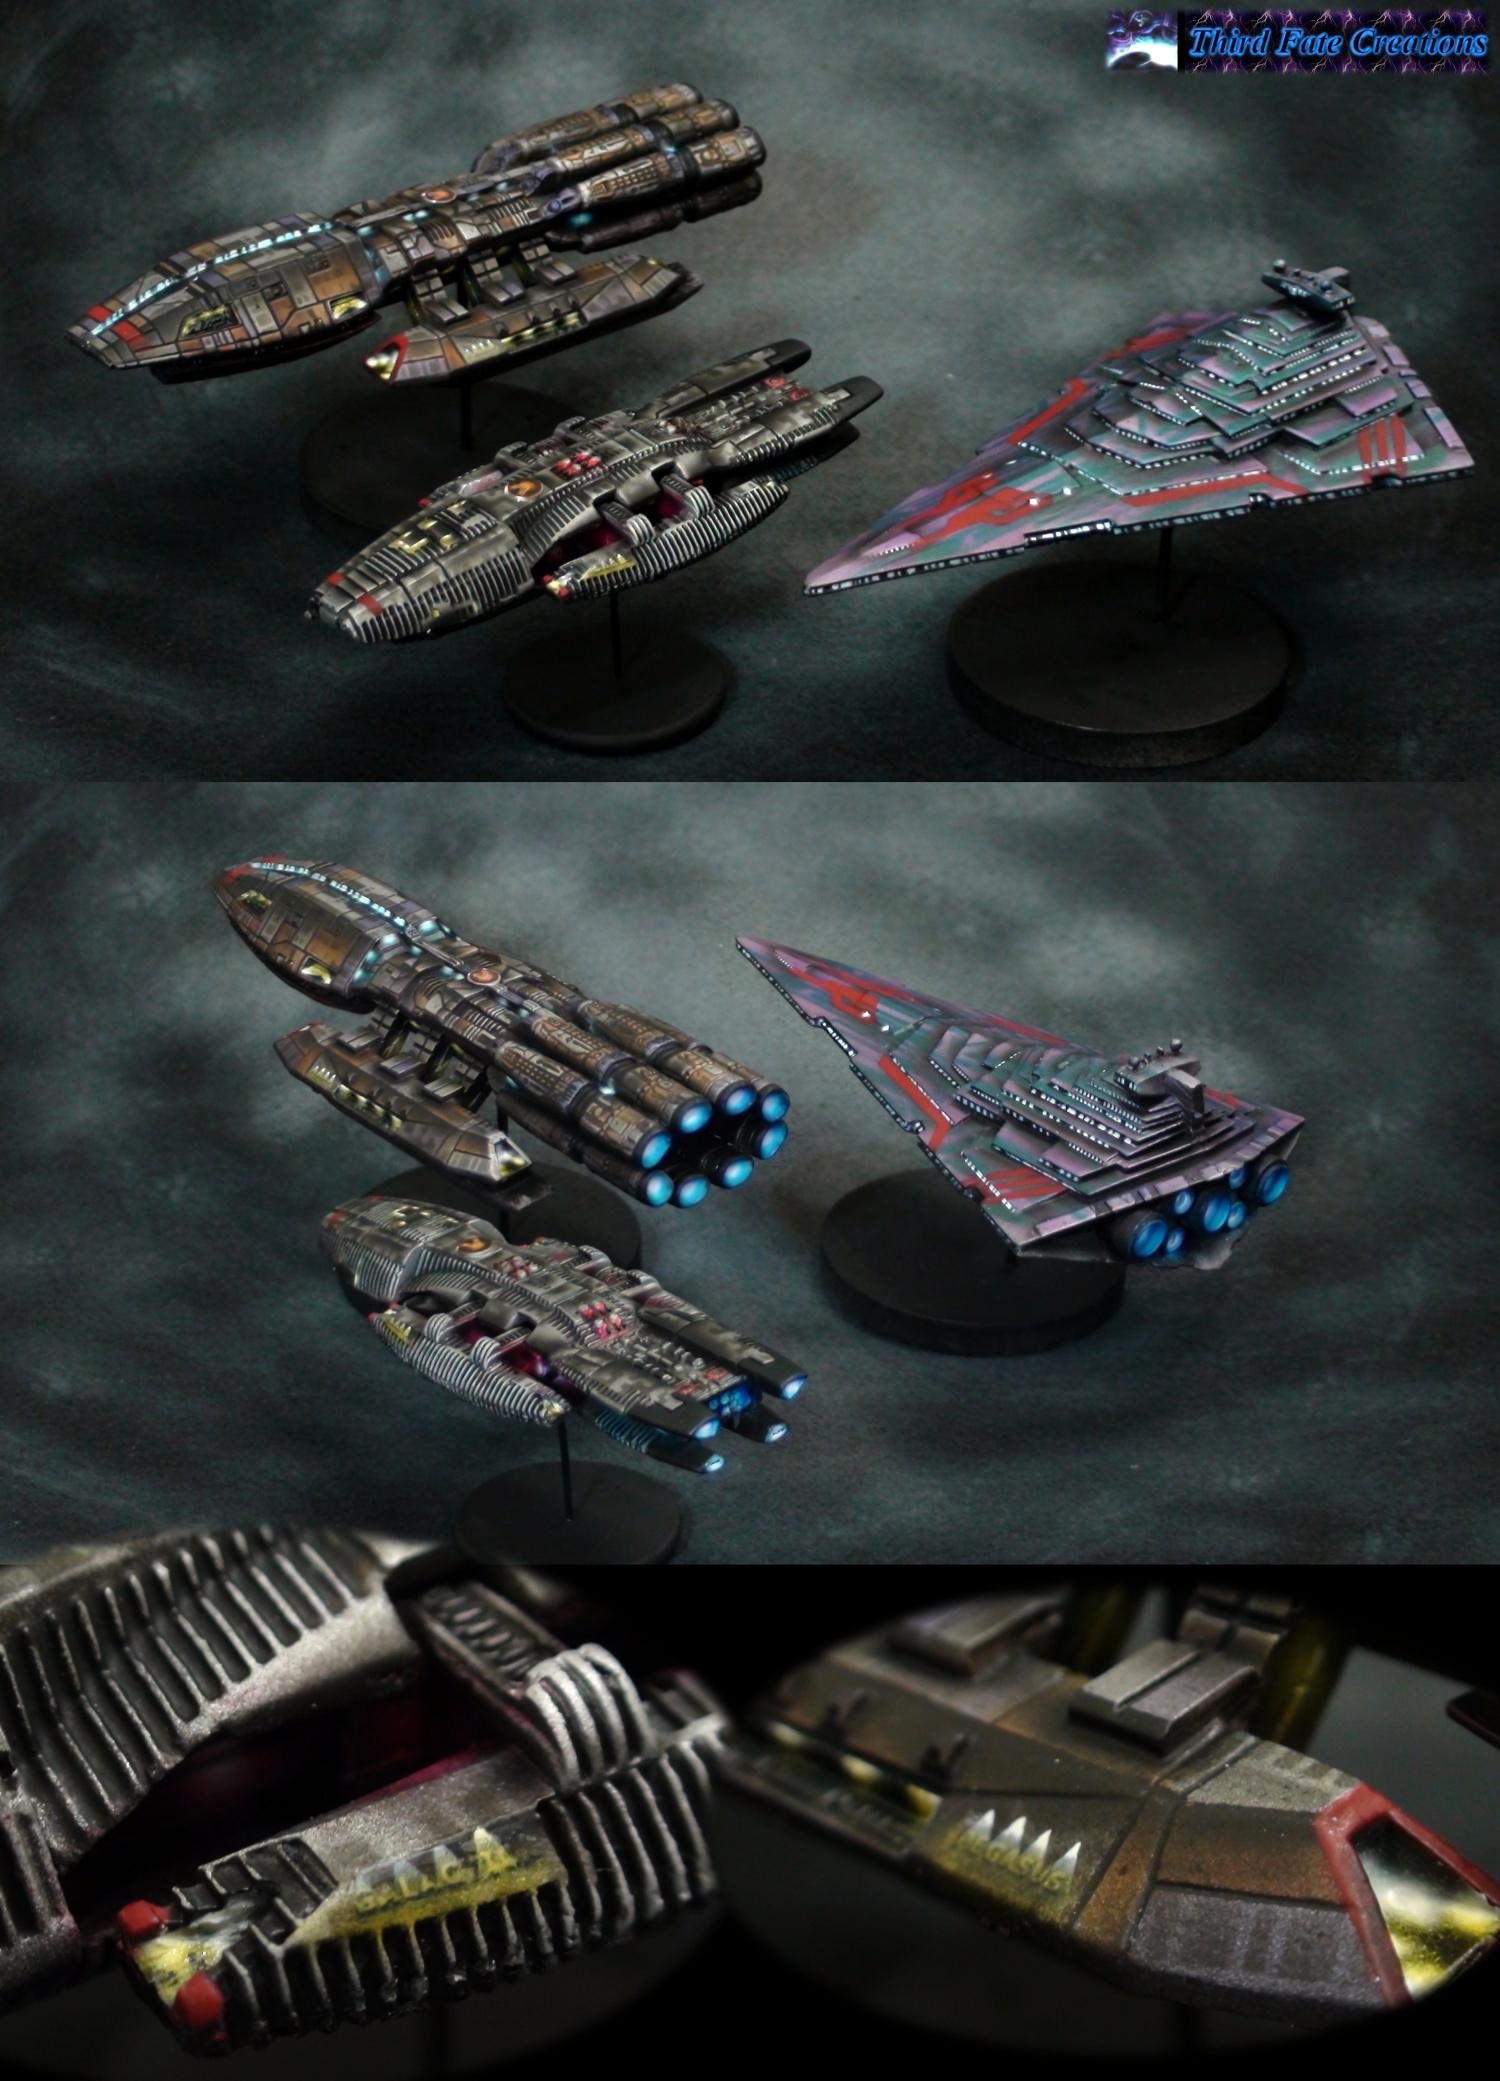 Battlestar Galactica, Pegasus, Space, Space Ships, Star Destroyer, Star Wars, Starships